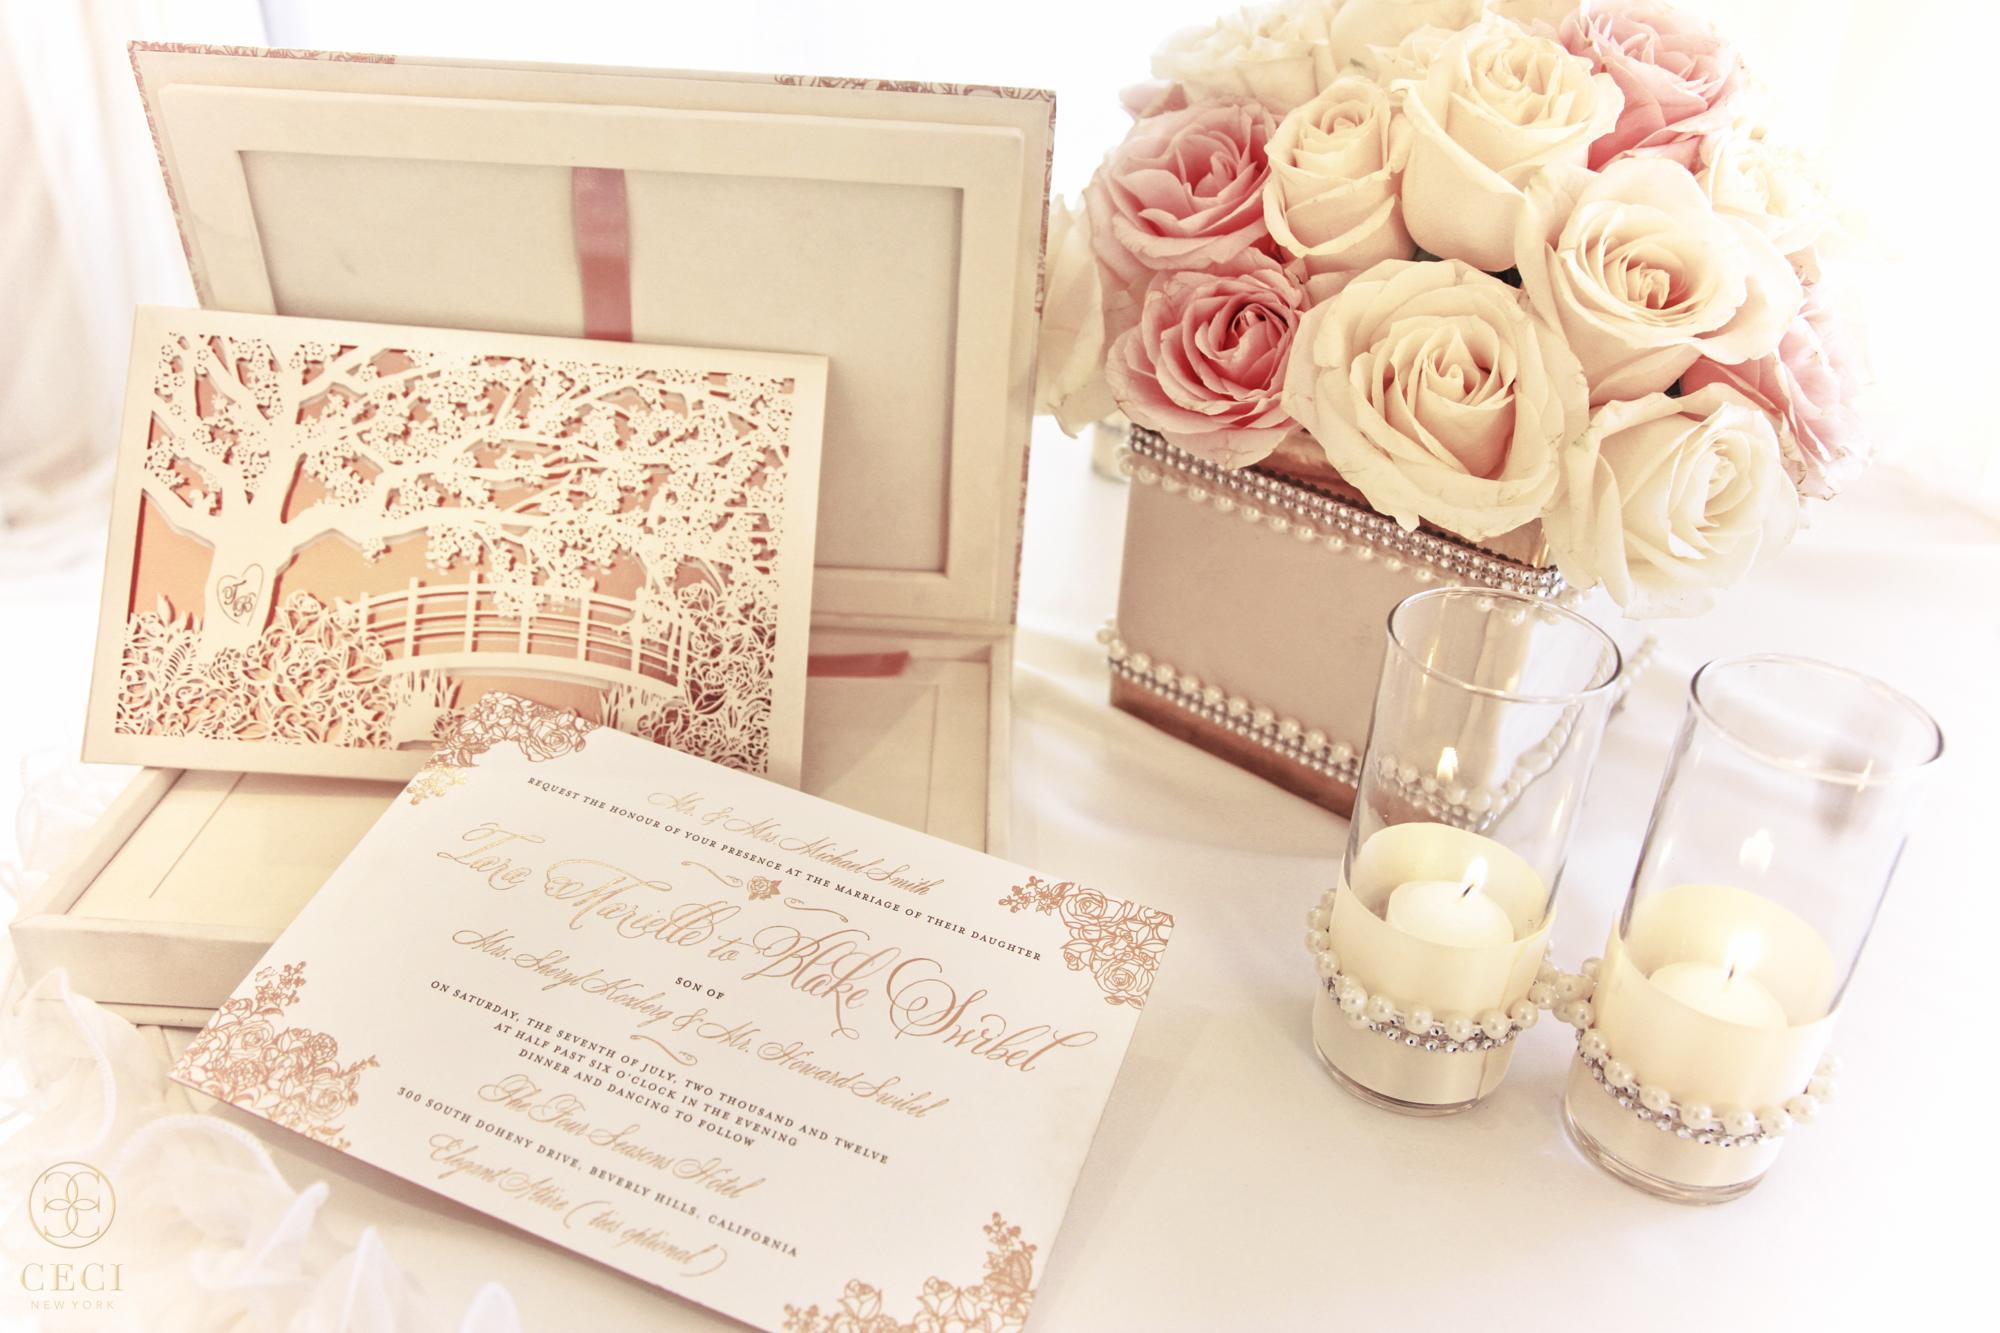 rose_gold_pink_romantic_real_wedding_roses_inspiration_cecinewyork_cecistyle_v152_1-1.jpg